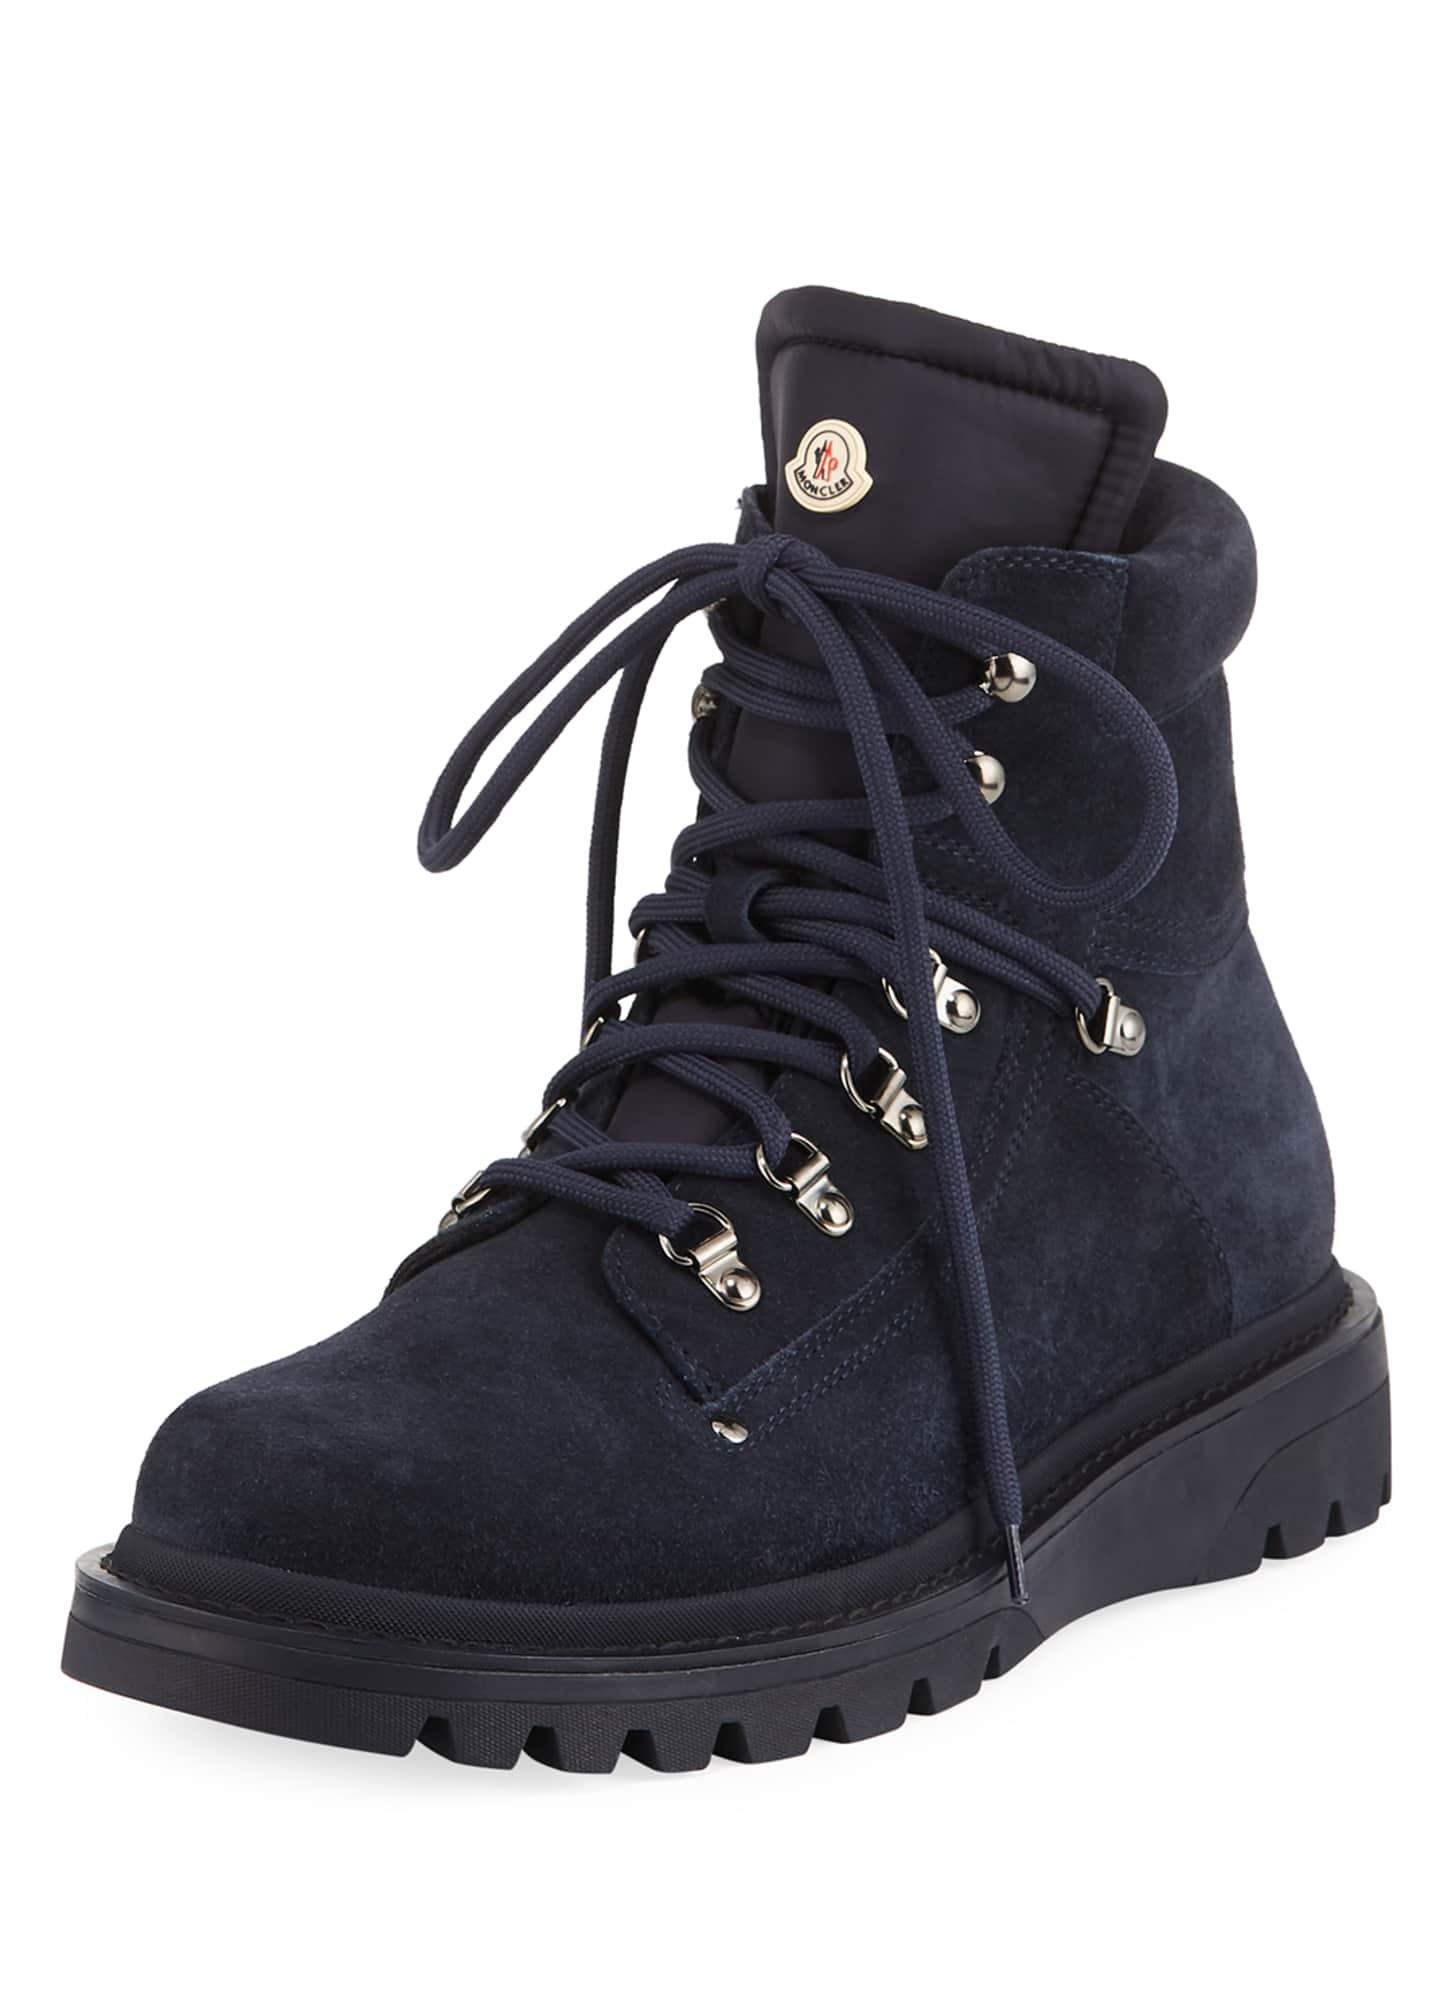 Moncler Men's Egide Suede Hiking Boots